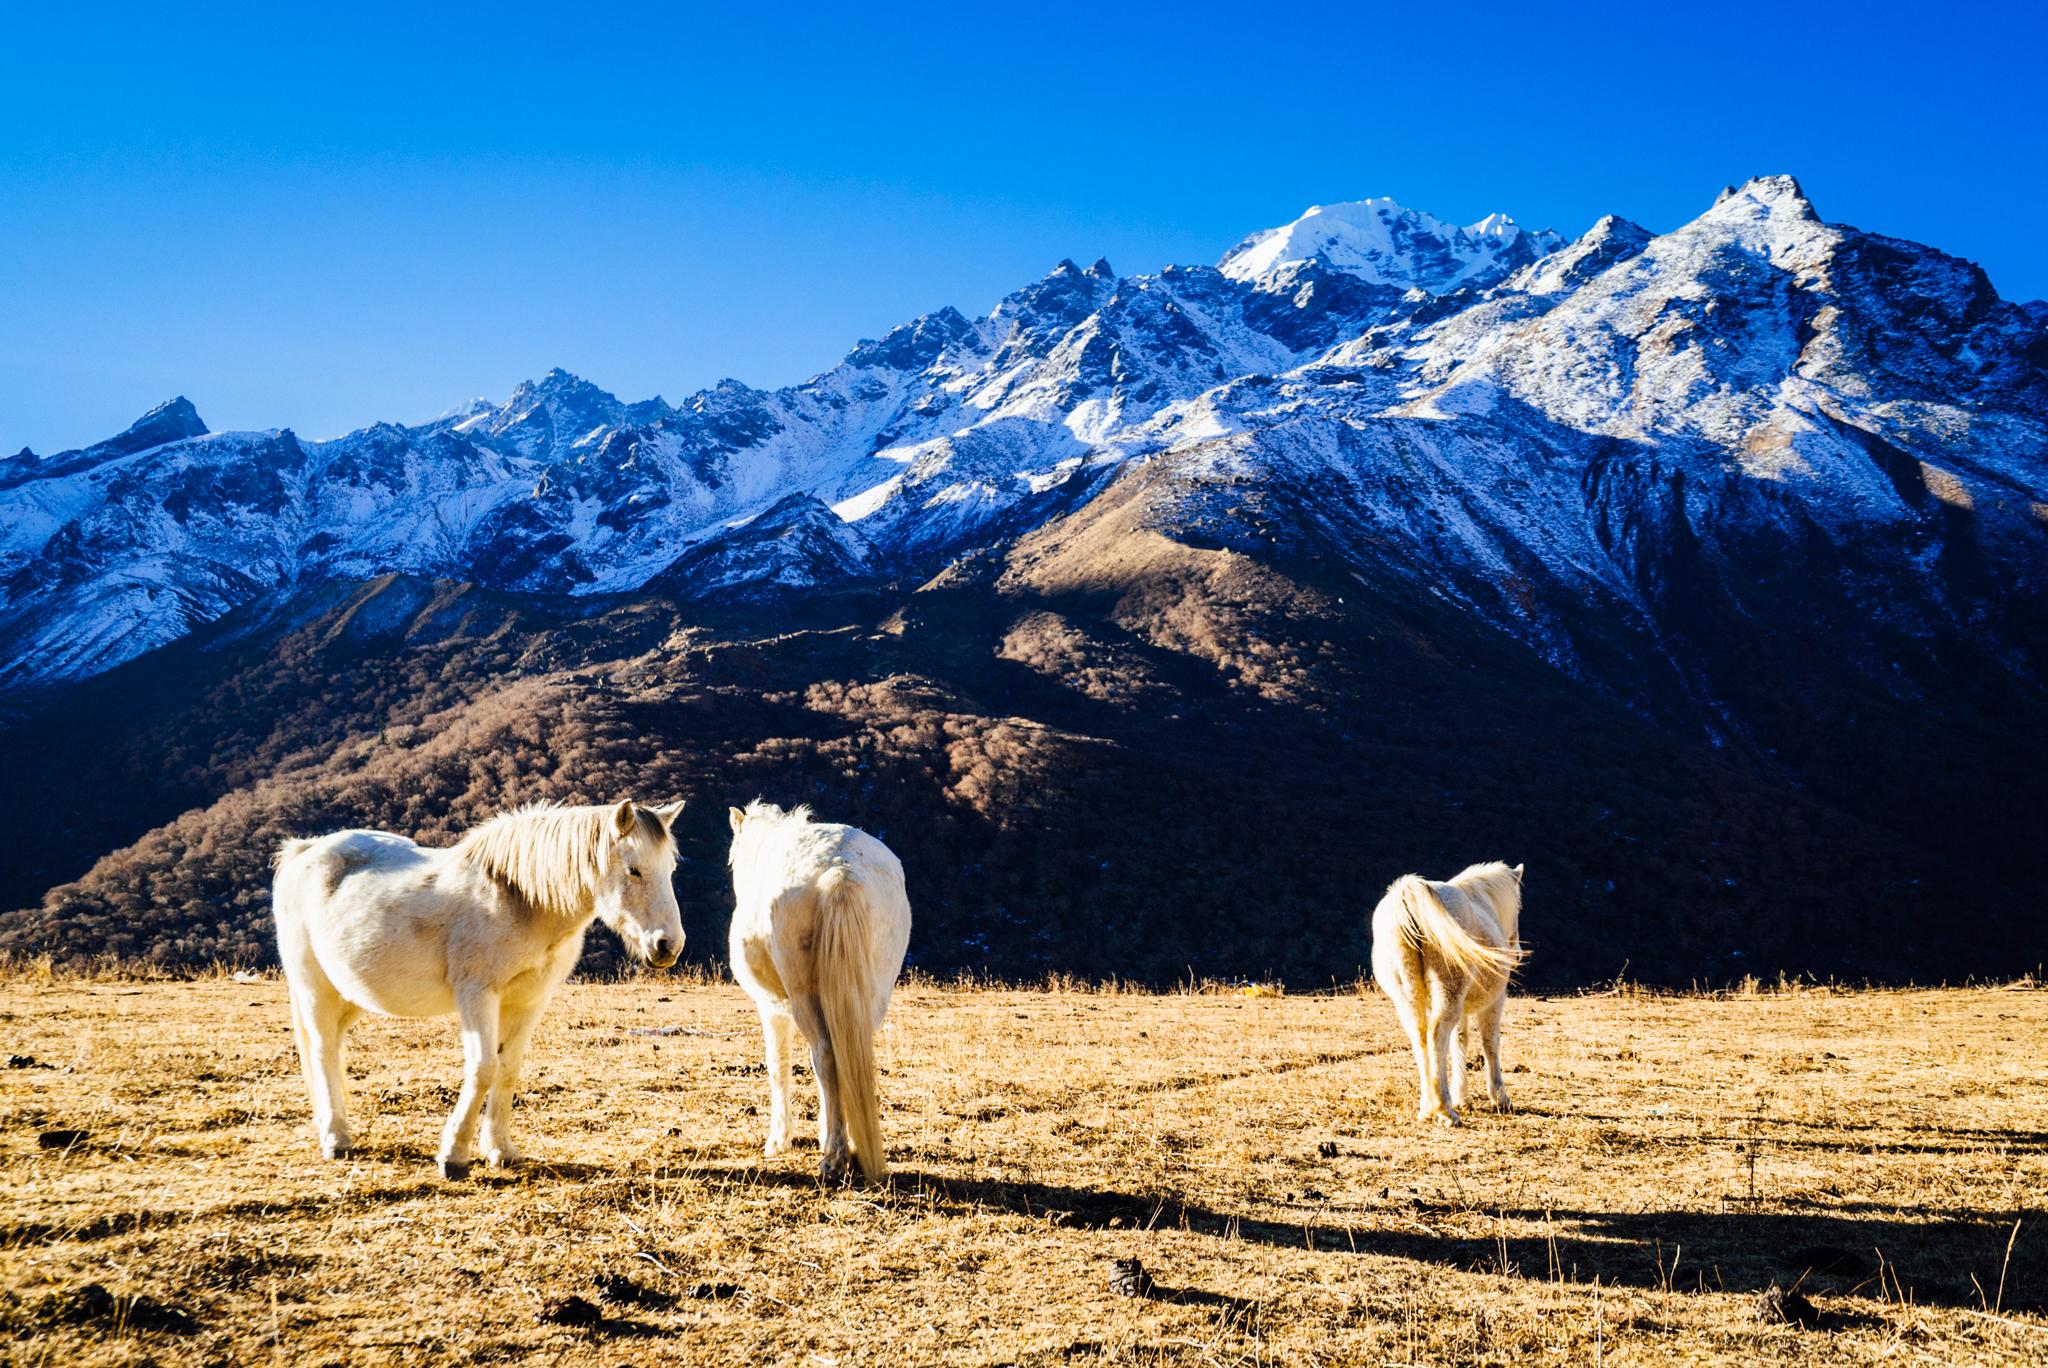 Langtang-Nepal-A7S-NOV15-42.jpg